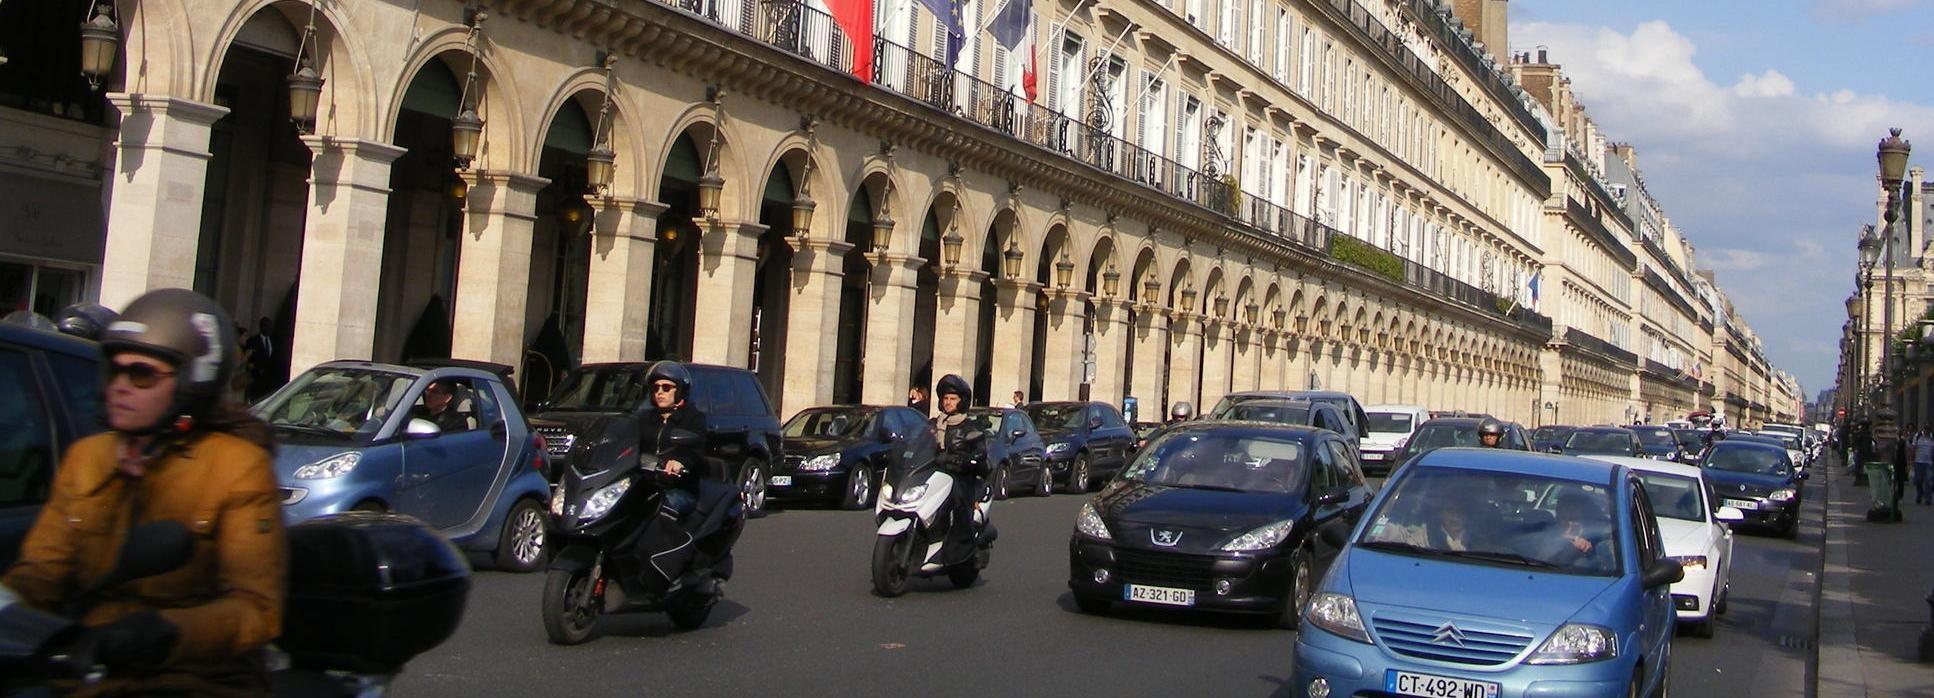 Paris Right Bank 2-Hour Private Walking Tour